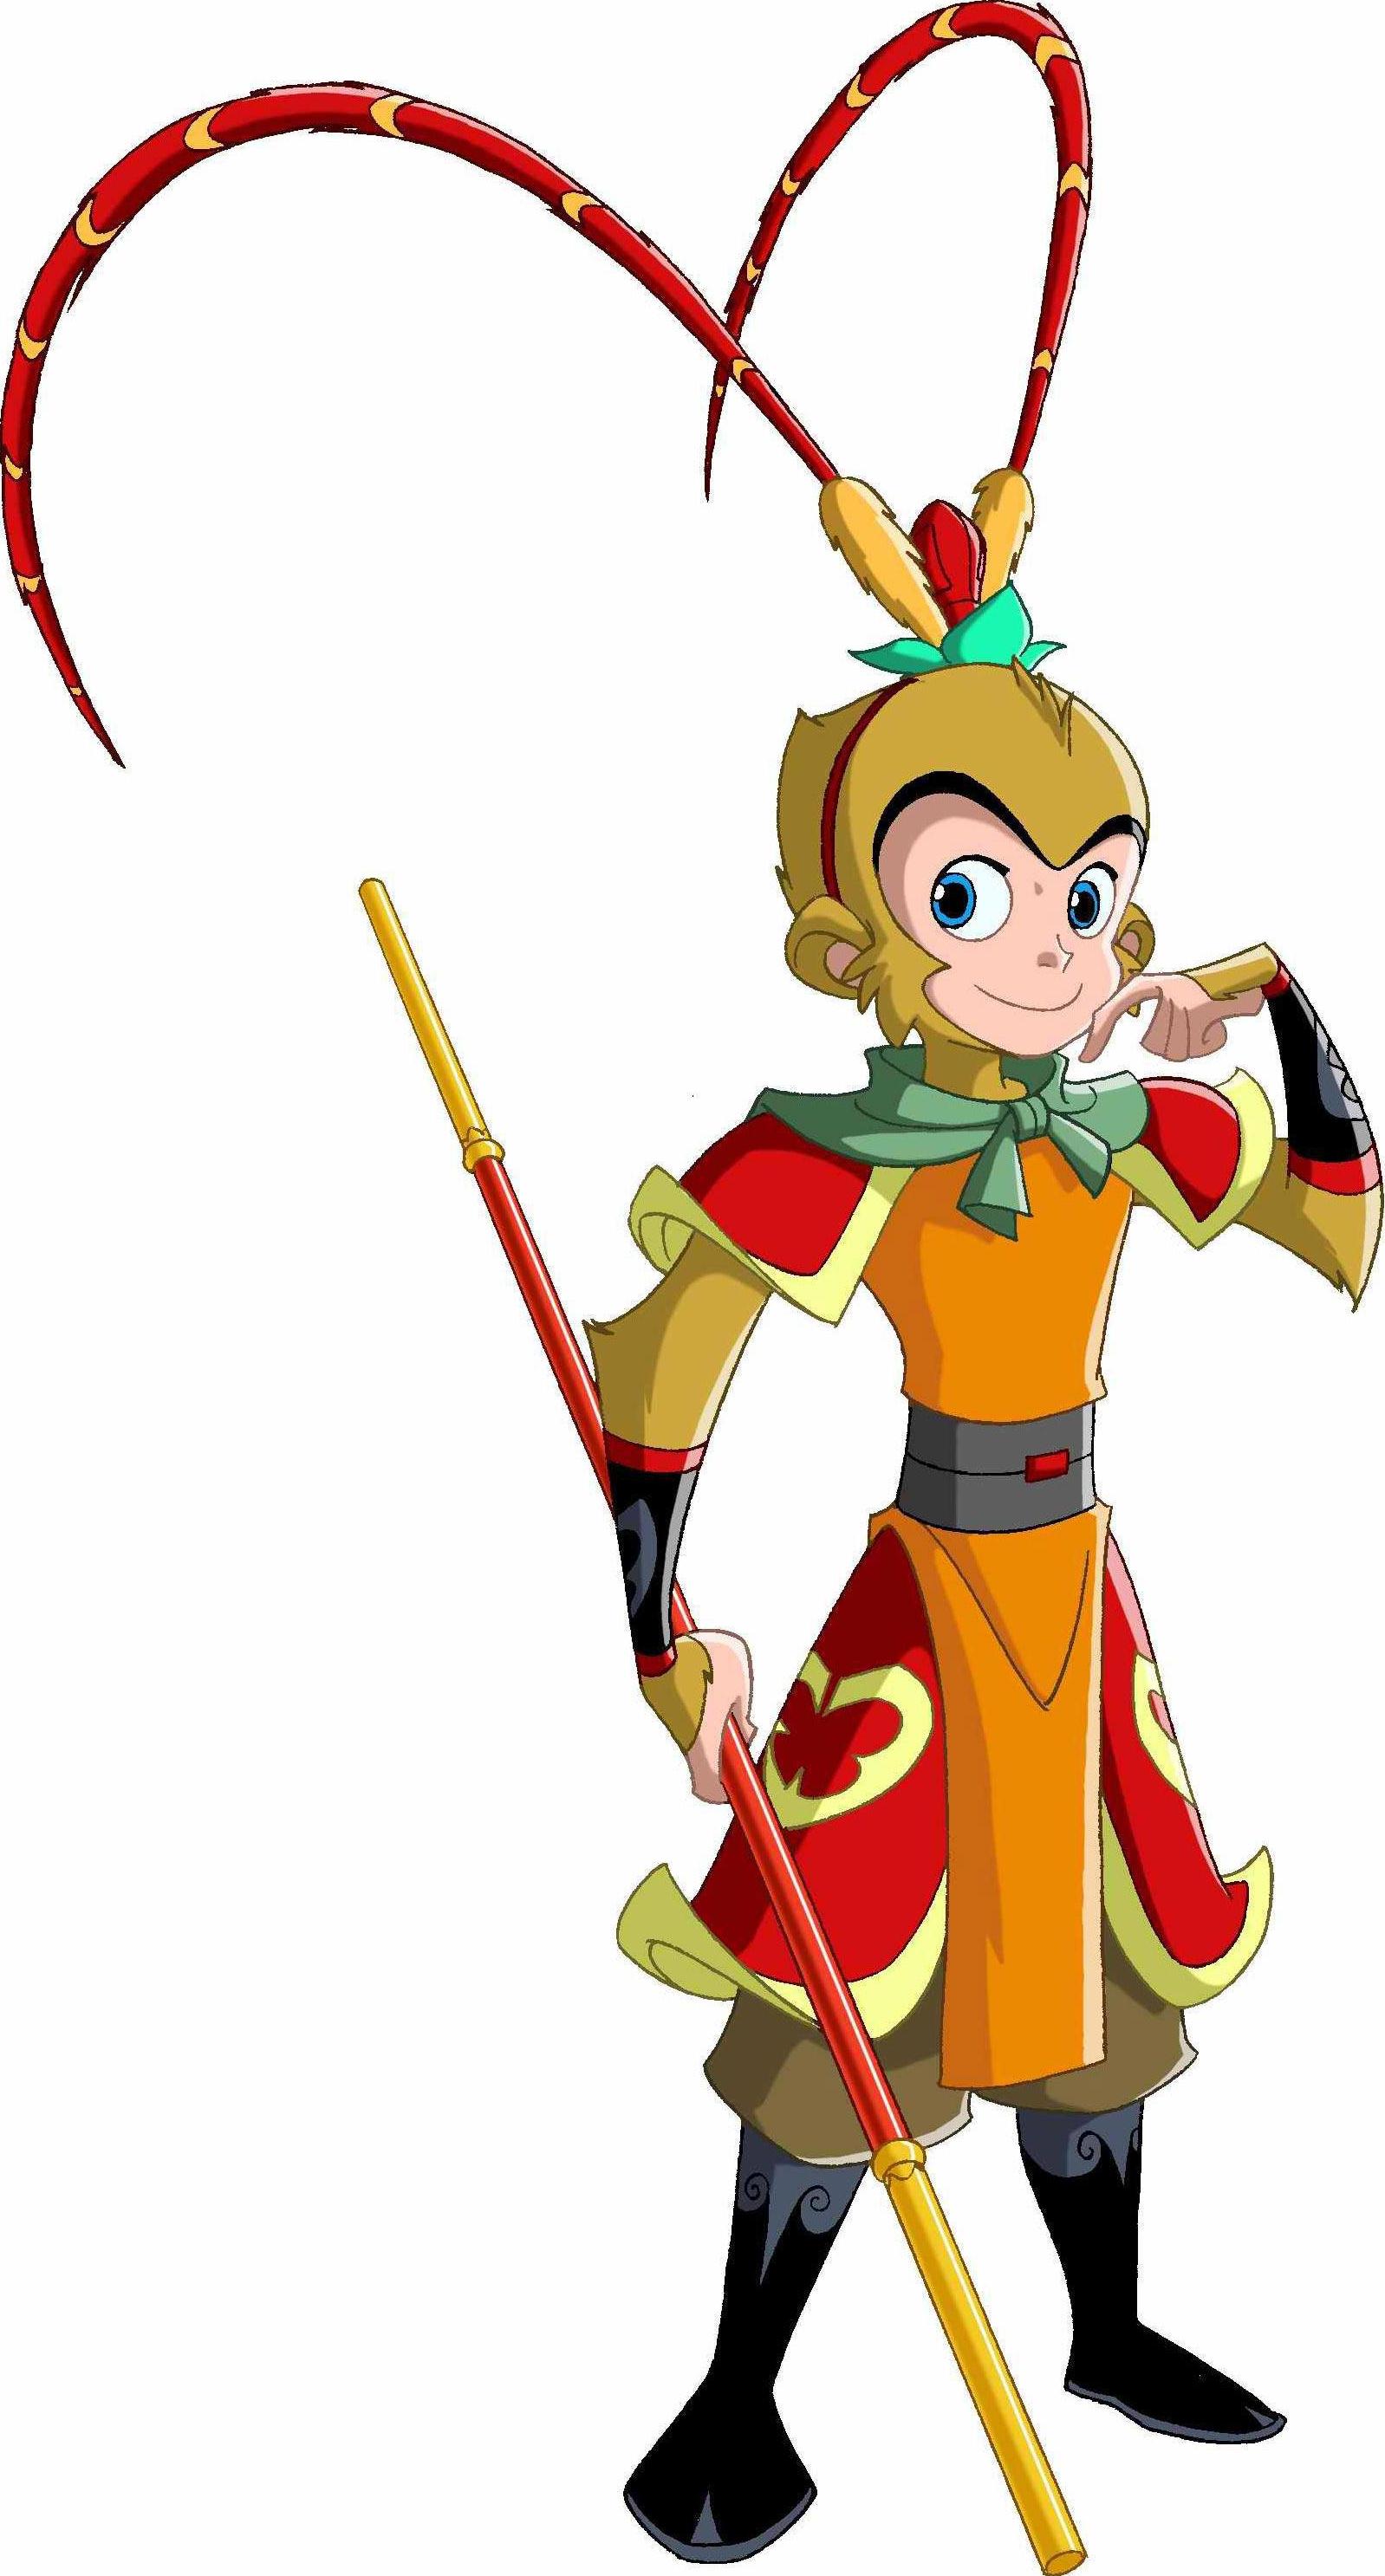 Clipart monkey costume. Sun wukong china journey